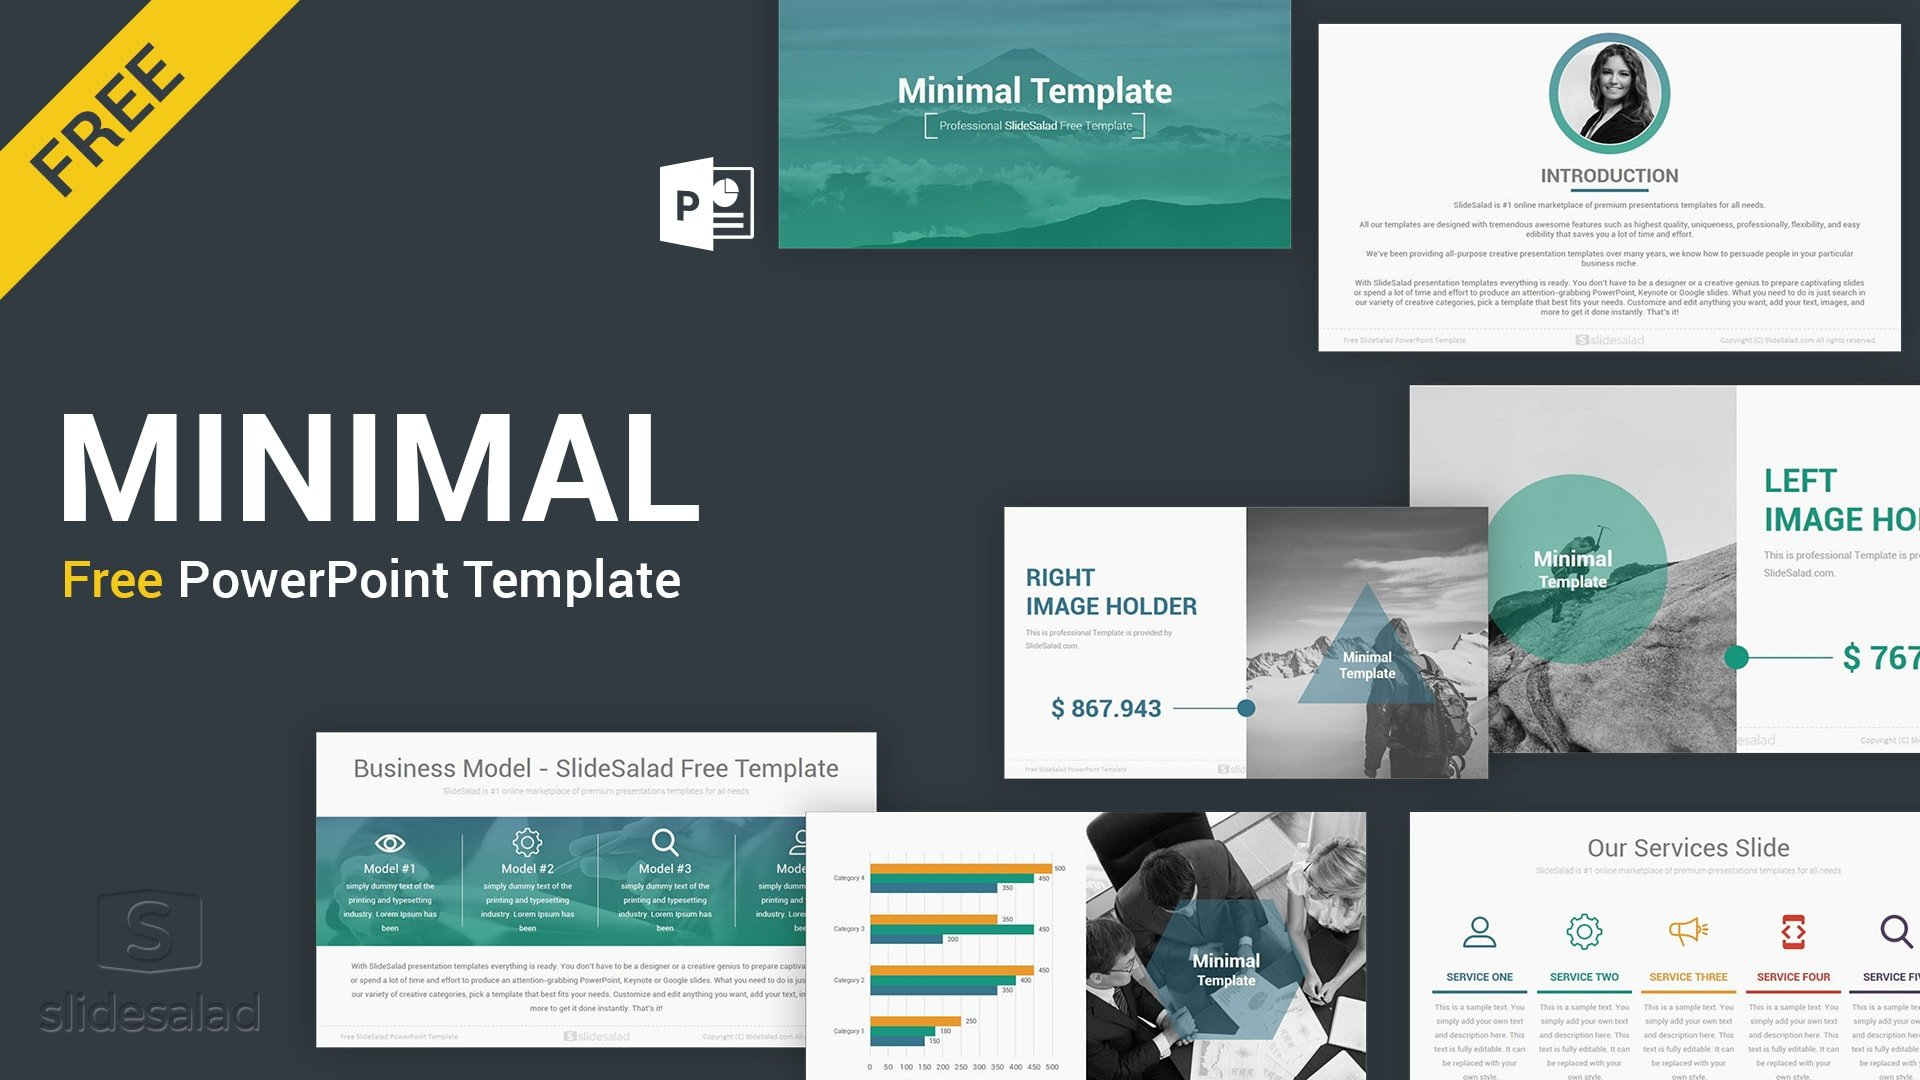 Ppt Presentation Template Free Best Free Presentation Templates Professional Designs 2019